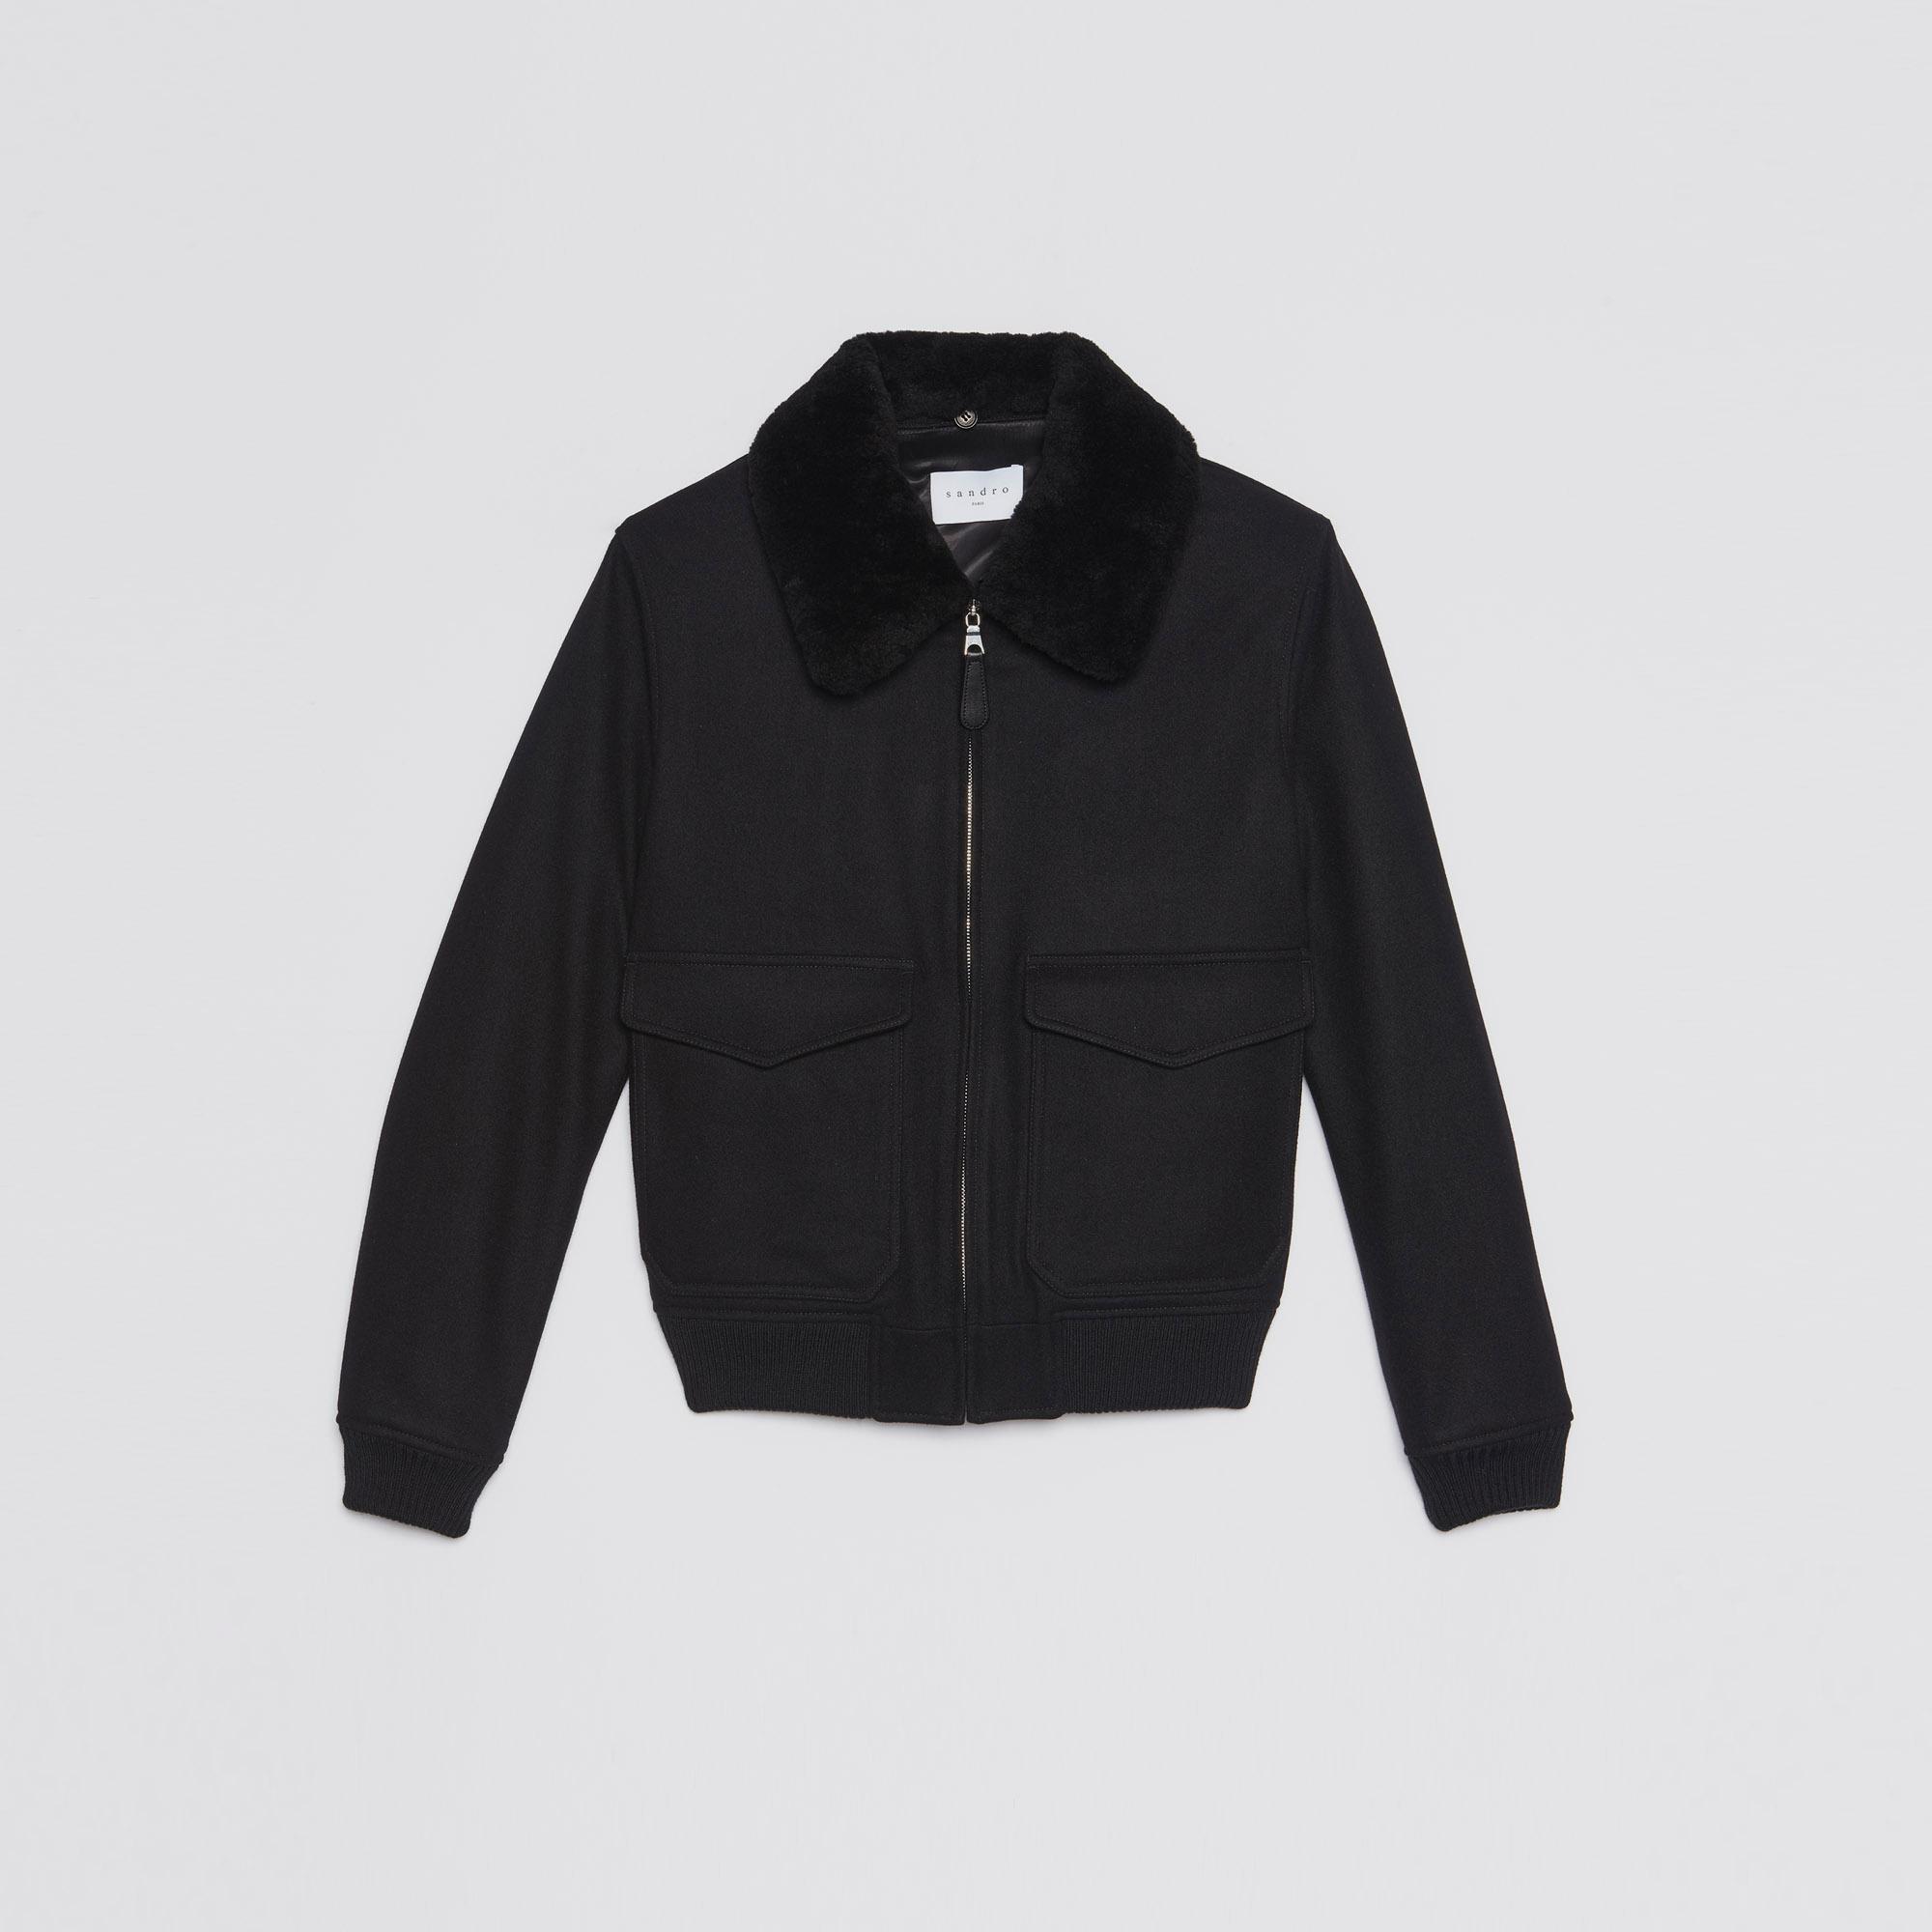 Aviator jacket with sheepskin collar - Blazers & Jackets - Sandro ...